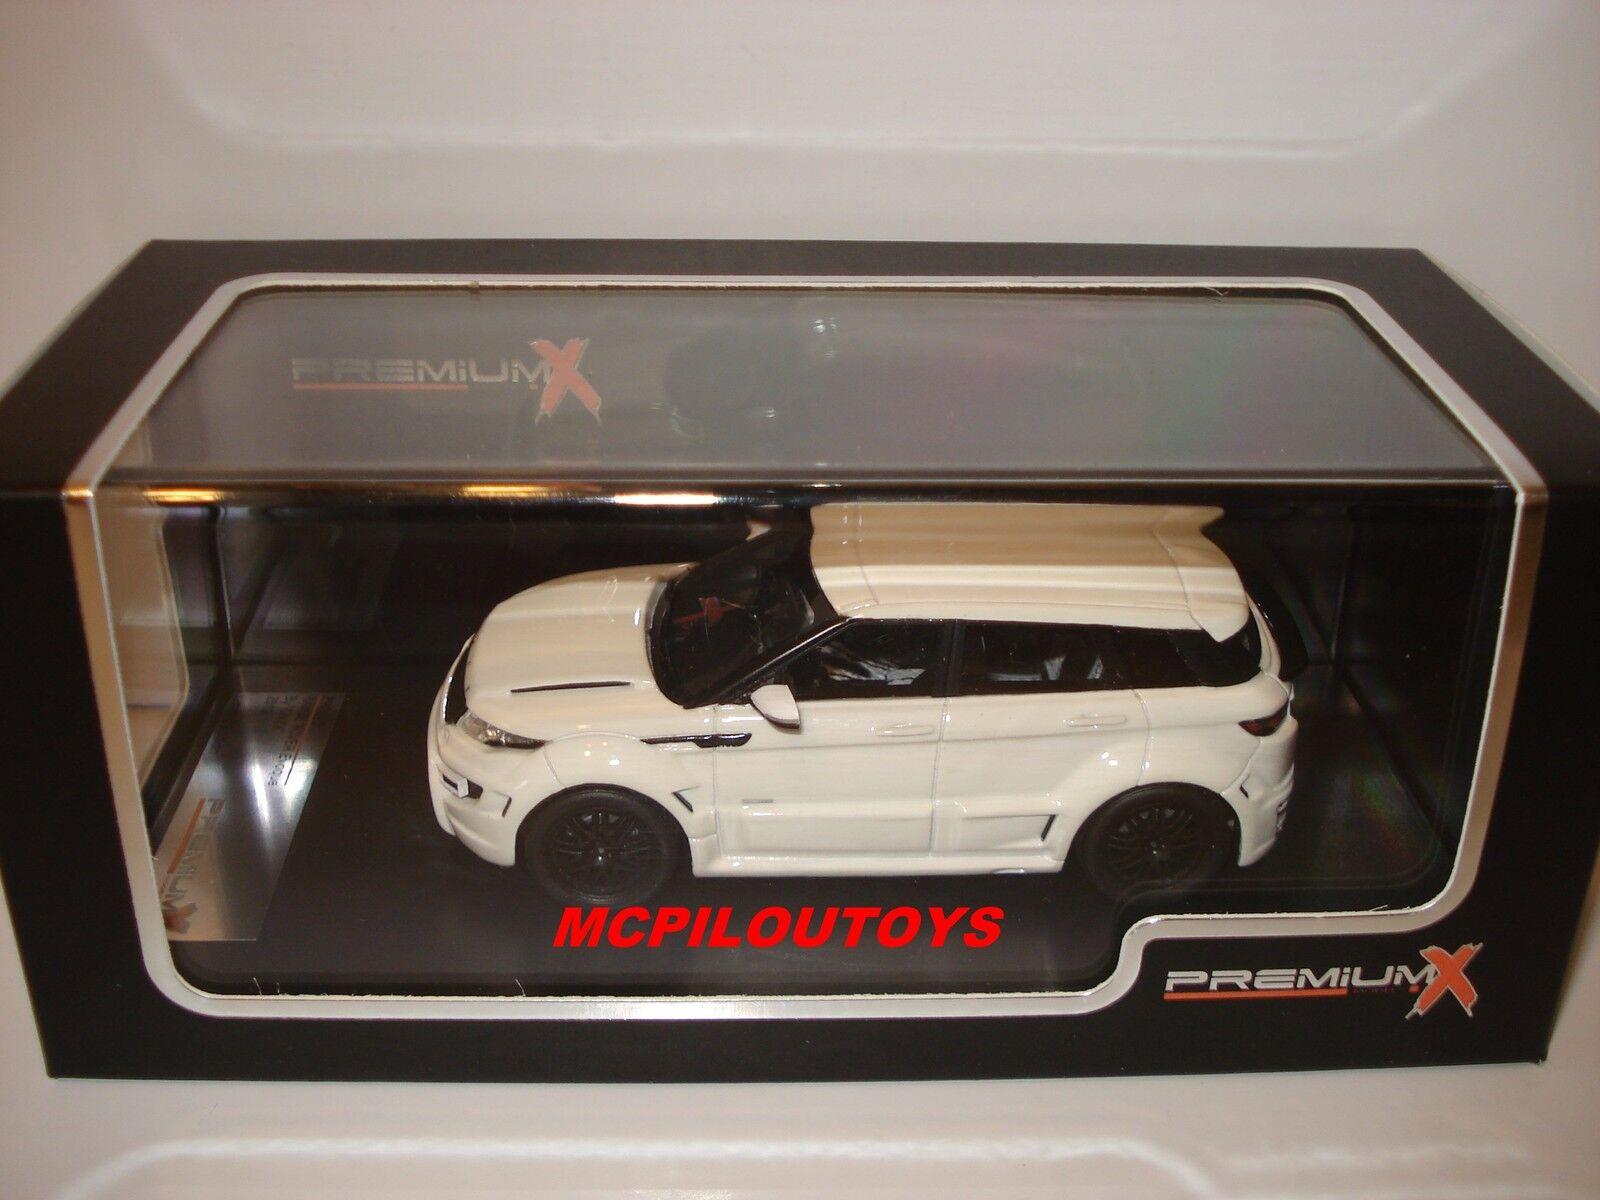 Premium-x PR0273 Range Rover Evoque by Onyx 2012 au 1 43°